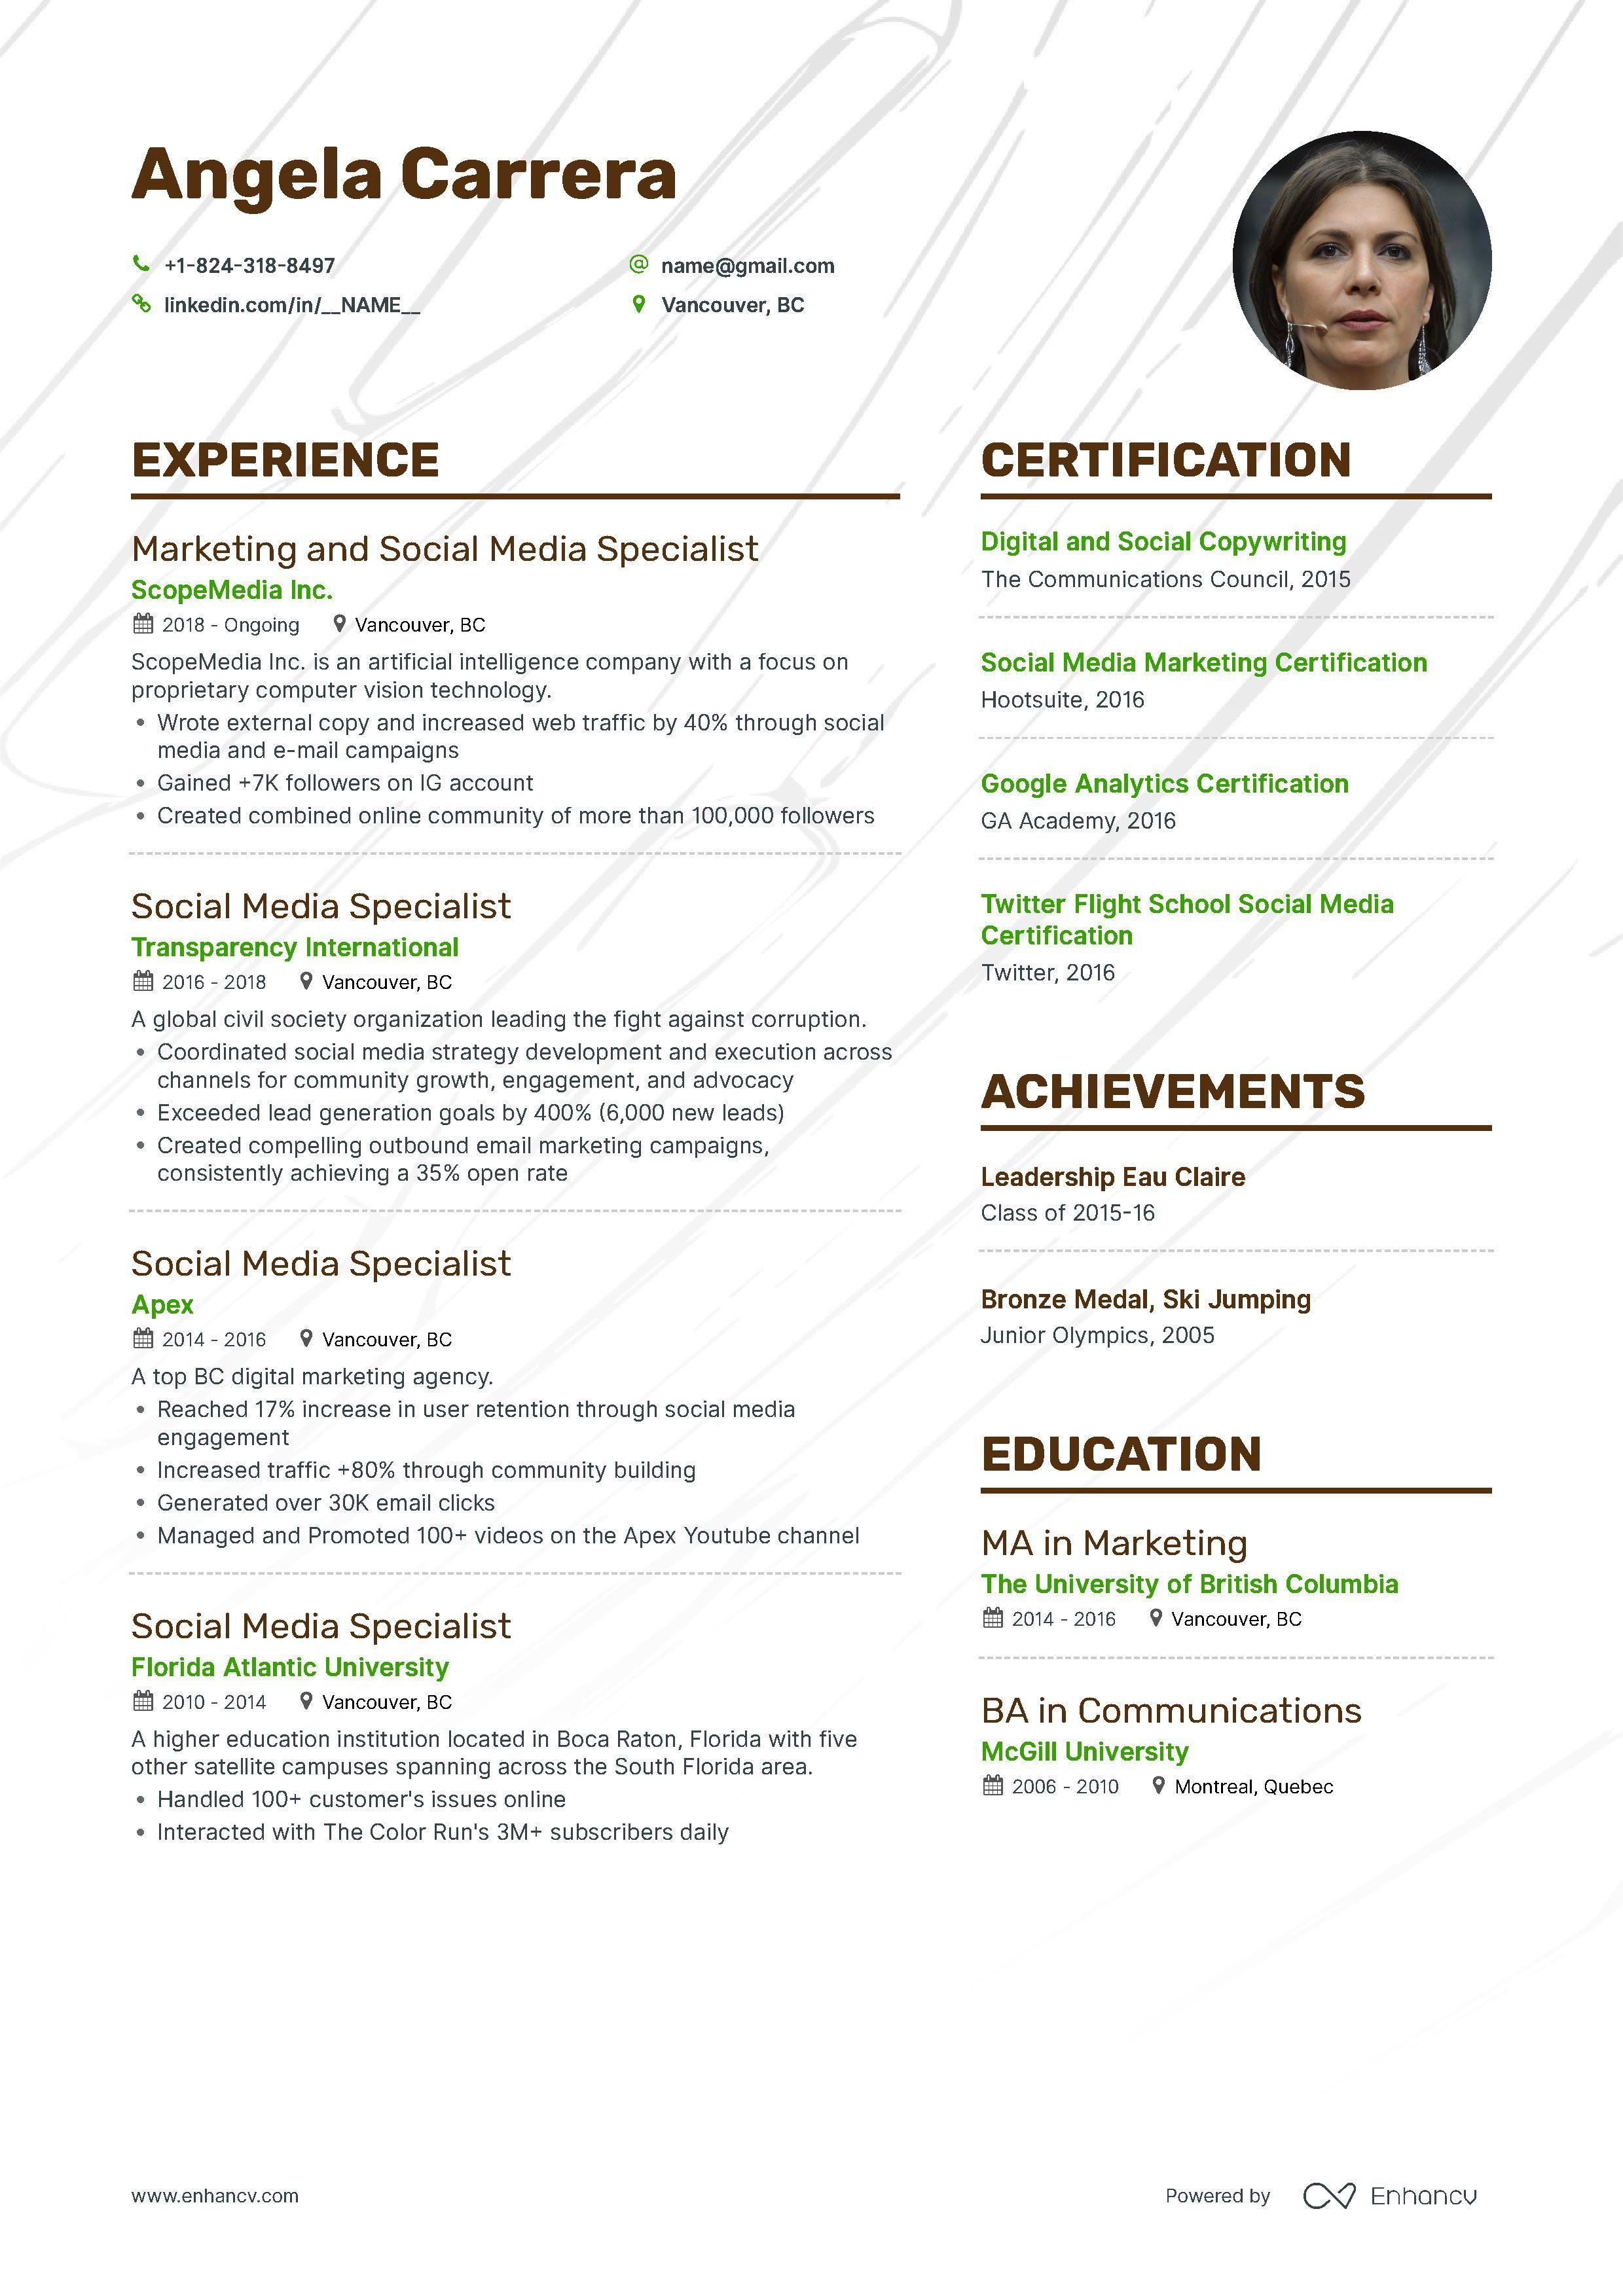 Social Media Marketing Resume Samples Expert Tips Marketing Resume Social Media Marketing Resume Examples